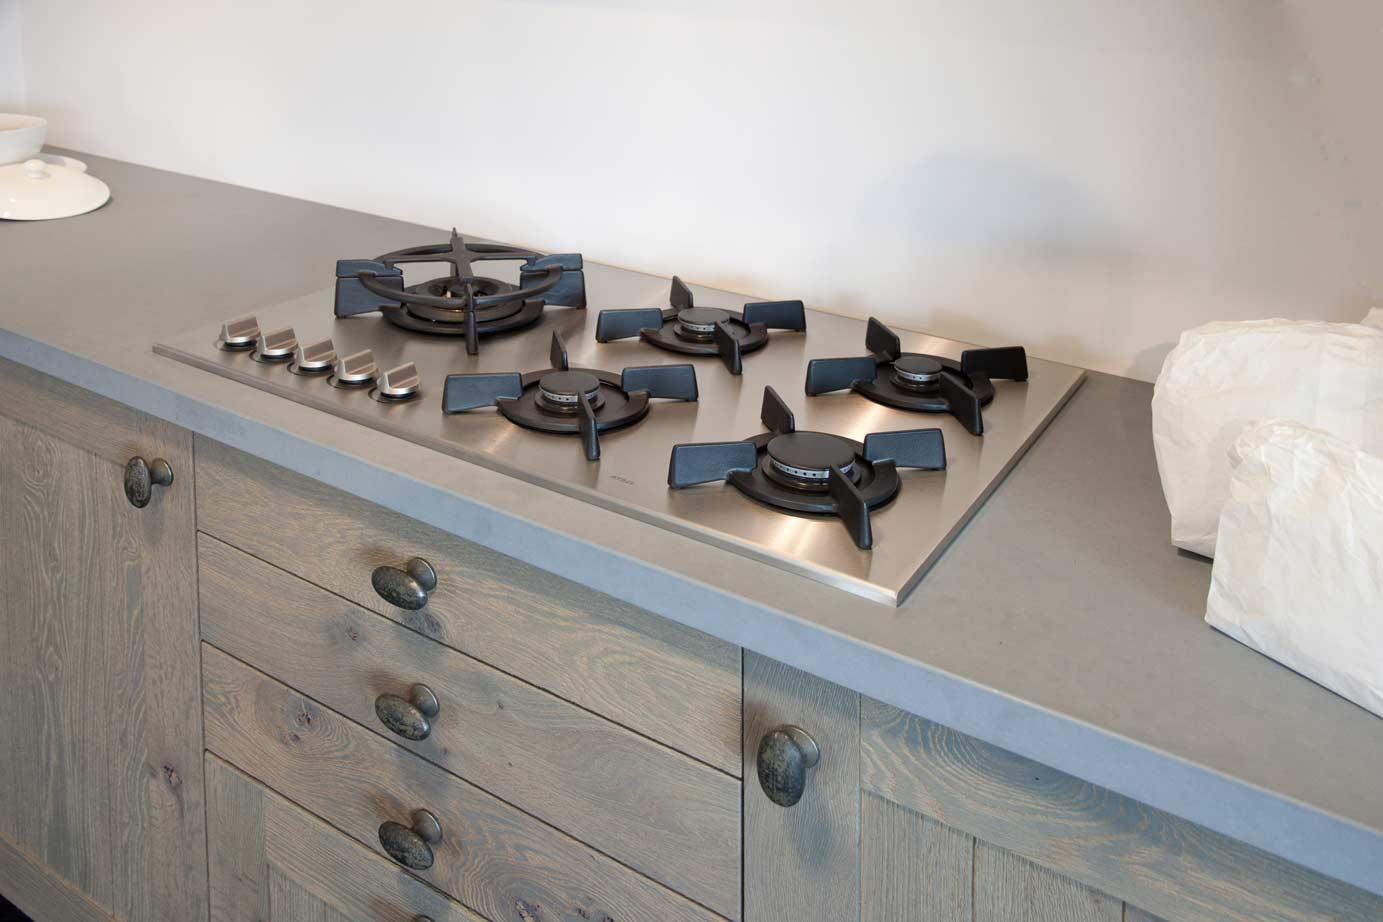 Kookplaten  DB Keukens # Atag Wasbak_072435